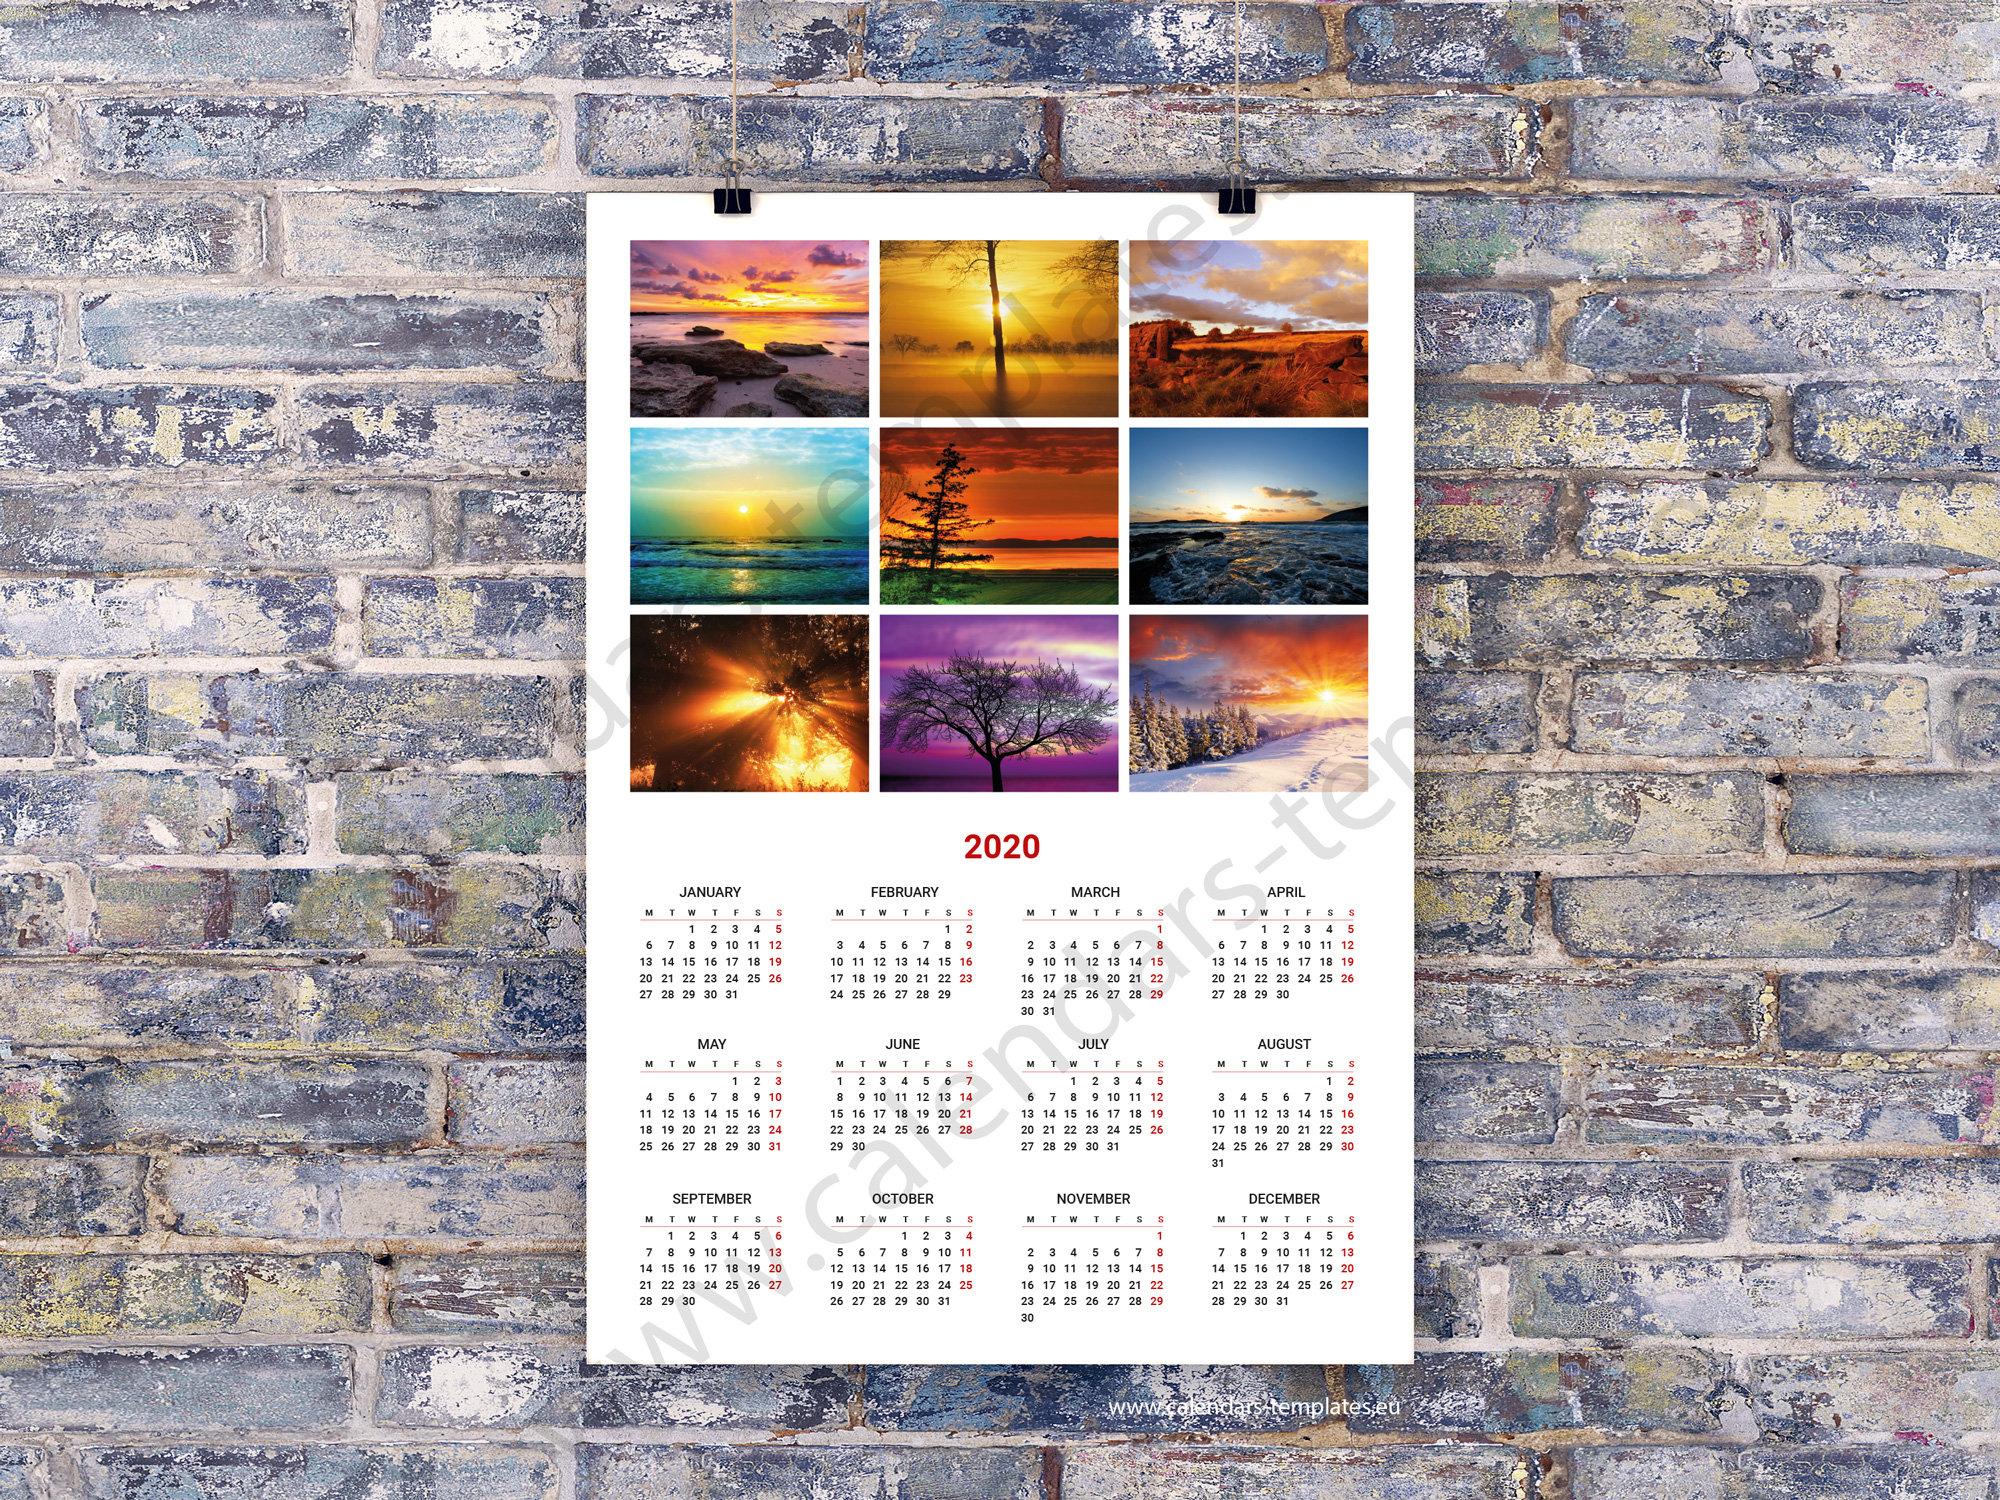 2020 Poster Wall Calendar Template (Kjp-W2) Pdf Format